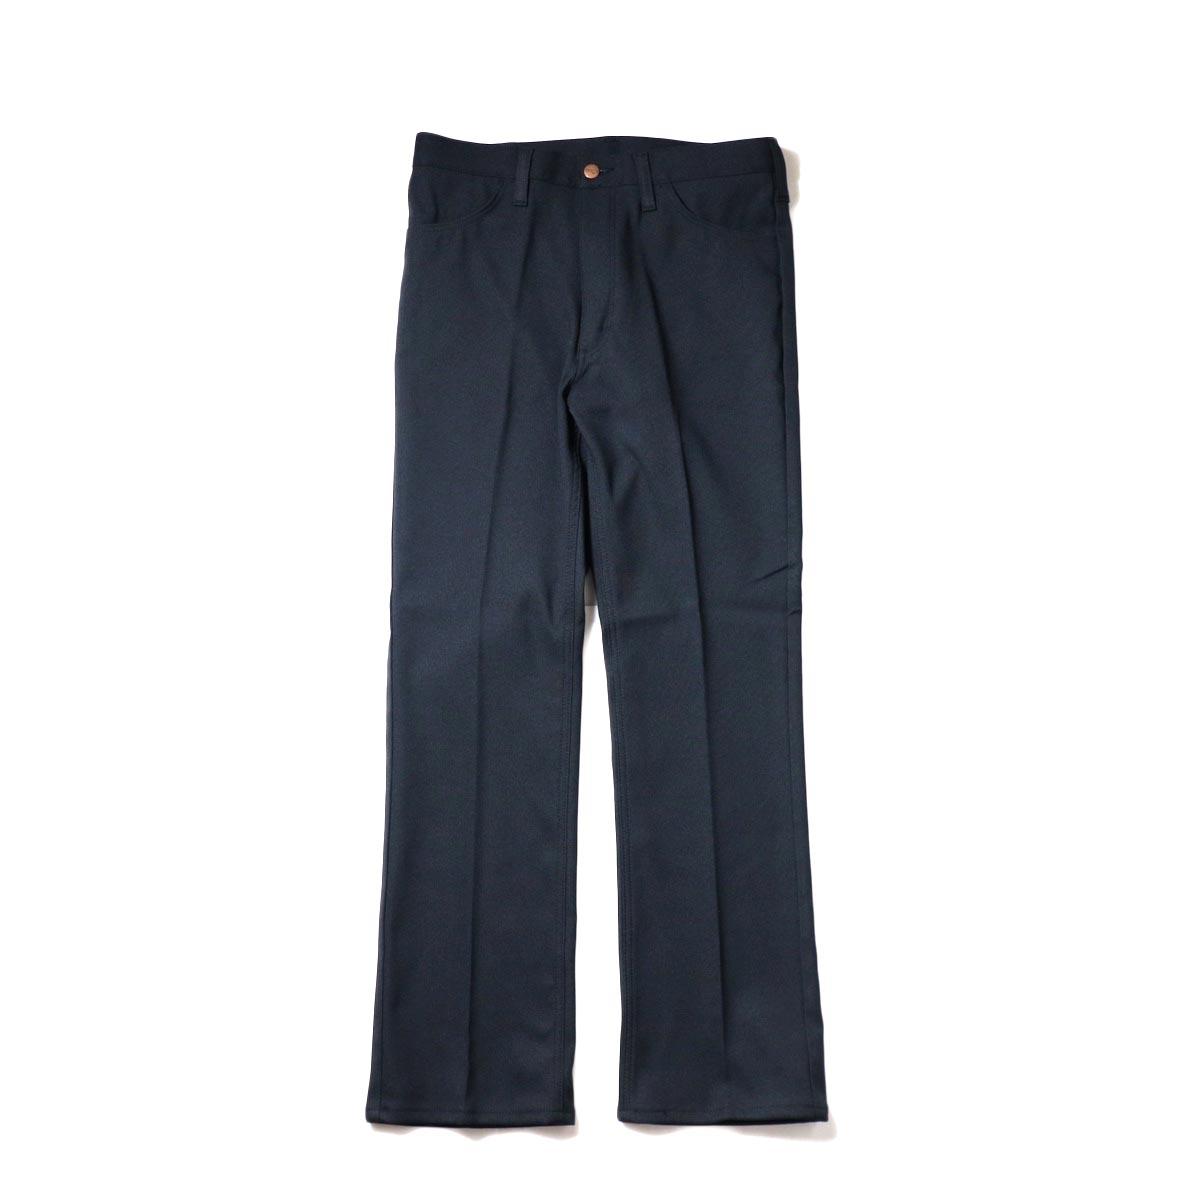 N.HOOLYWOOD × WRANGLER / 6211-WR01-039 Wrancher Dress Jeans (Black)